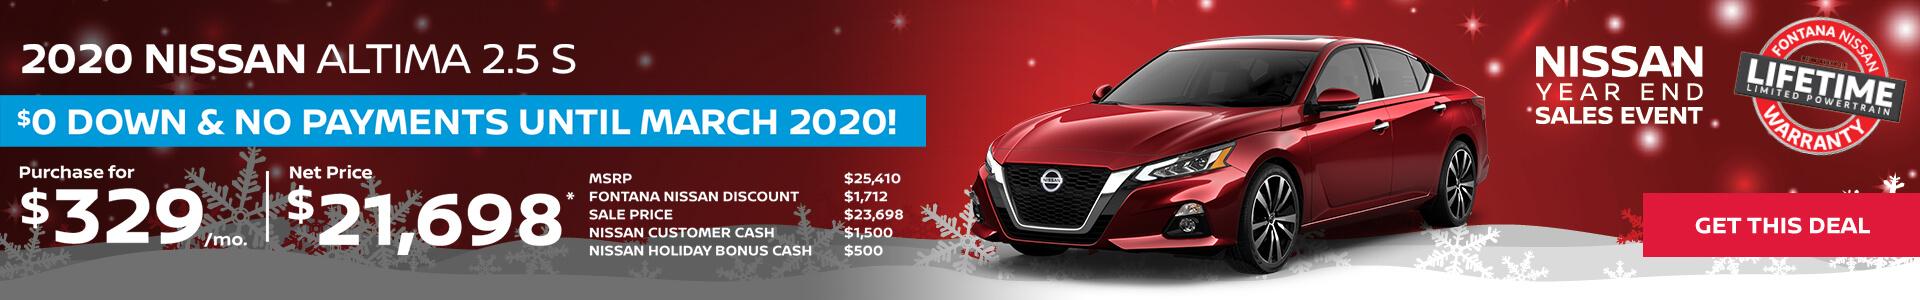 Nissan Altima $329